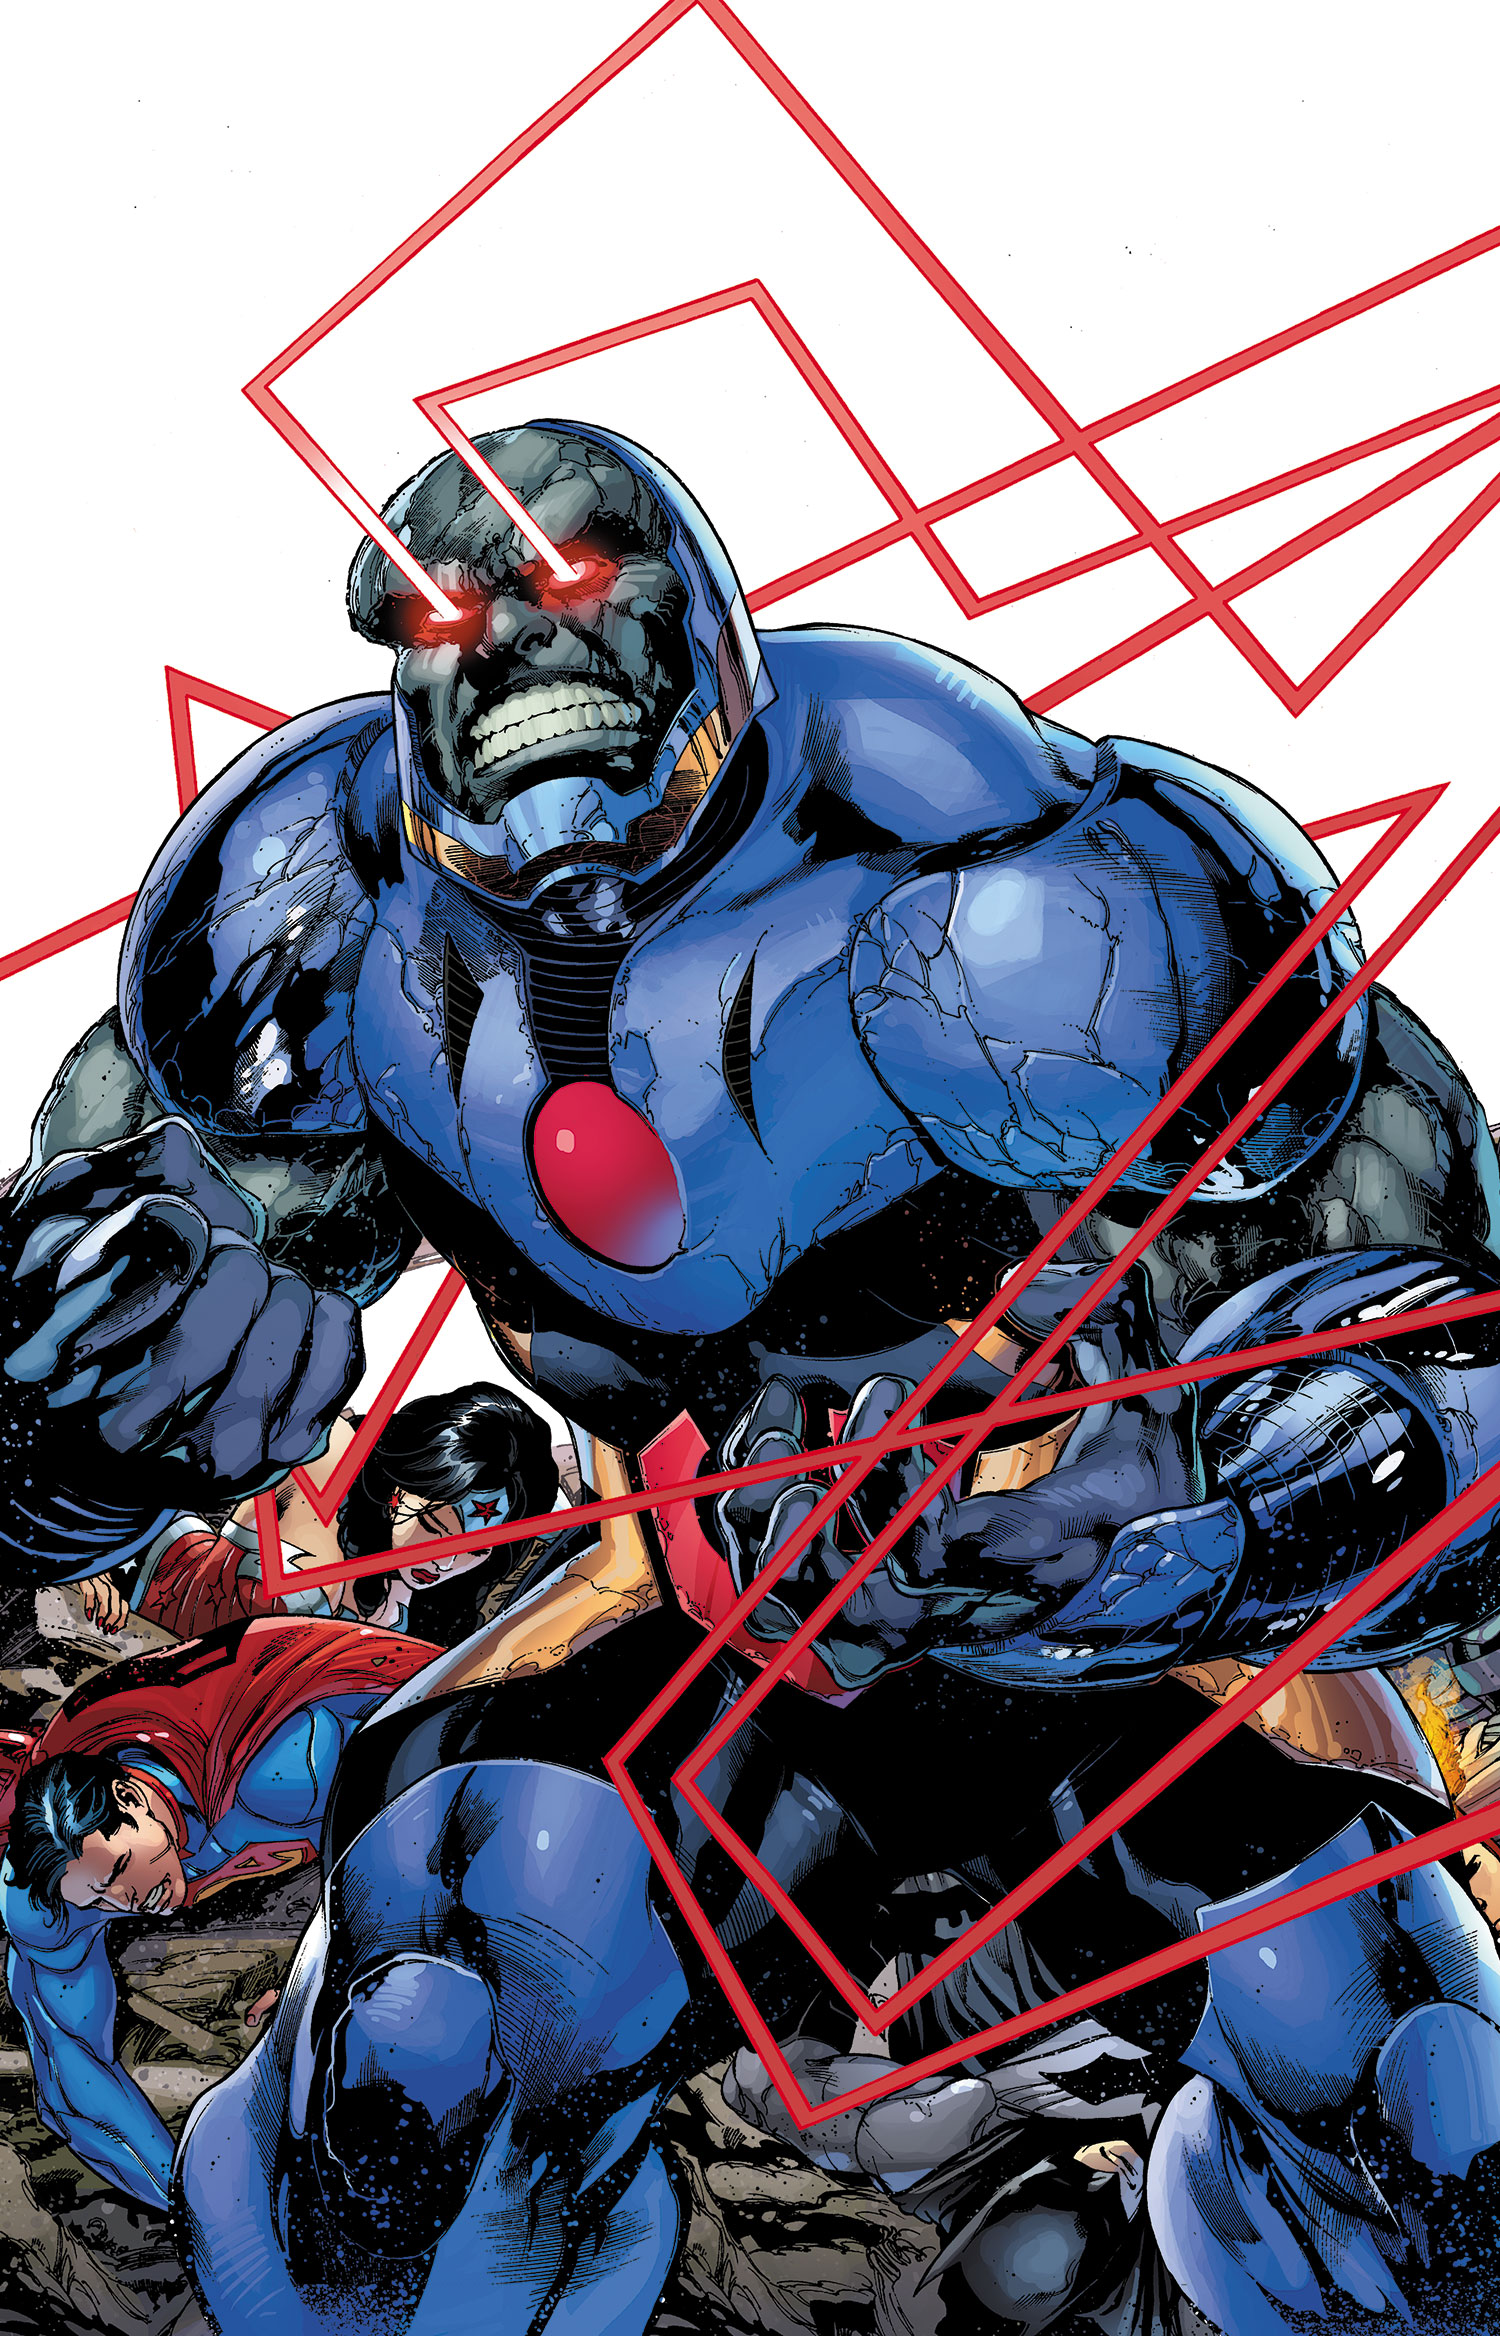 Justice League Vol 2 23.1 Darkseid Textless